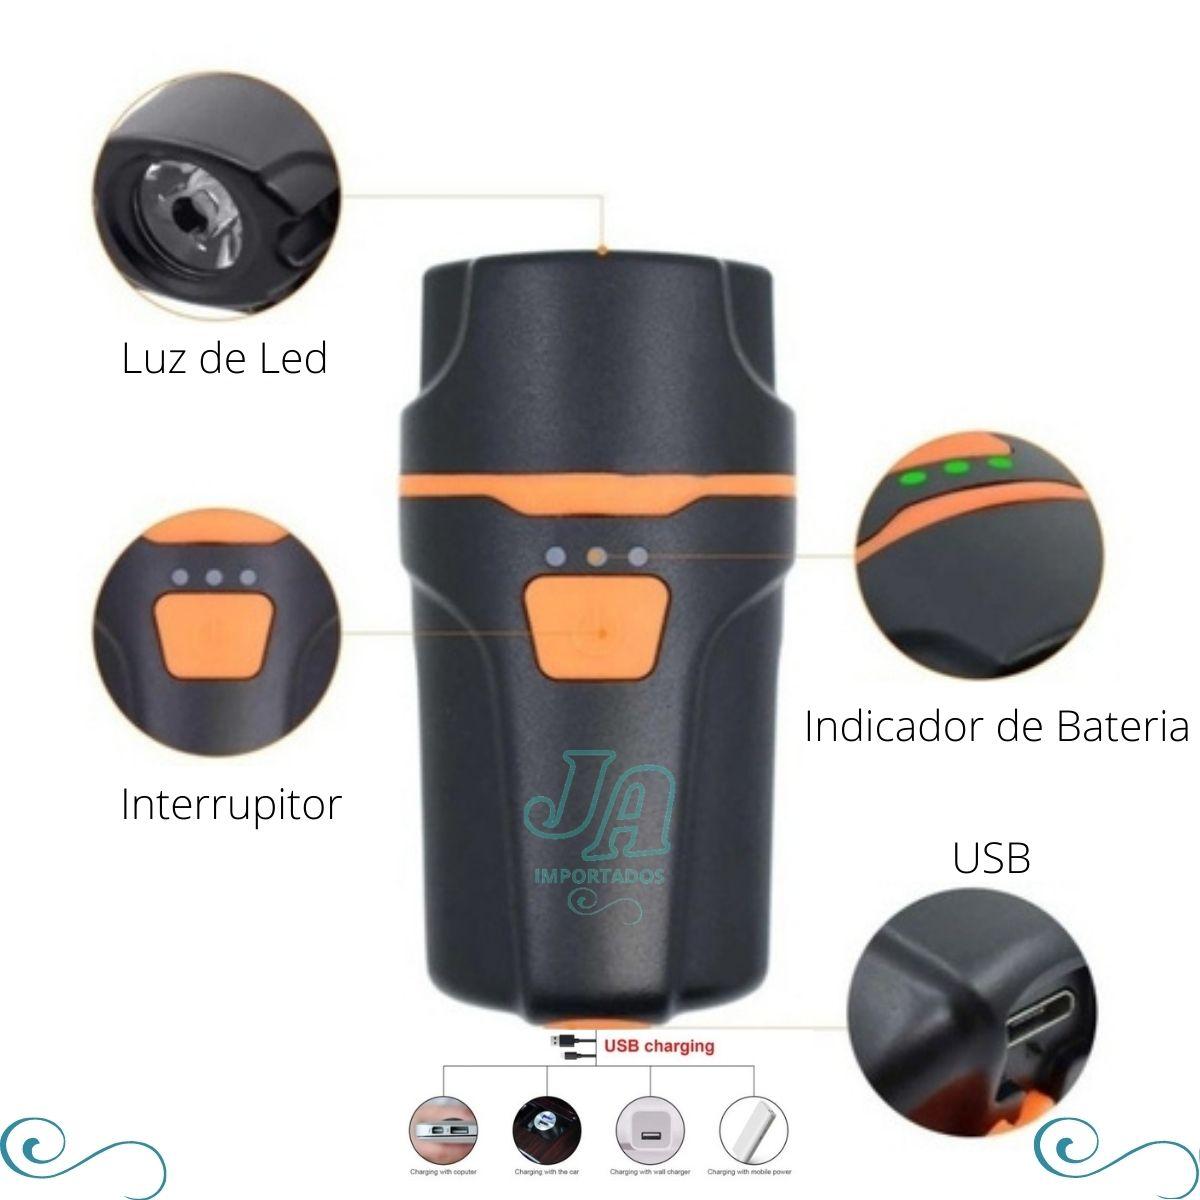 Farol Lanterna Bike Recarregável Usb Led Ultra Forte - LUZ LED PARA BICICLETA